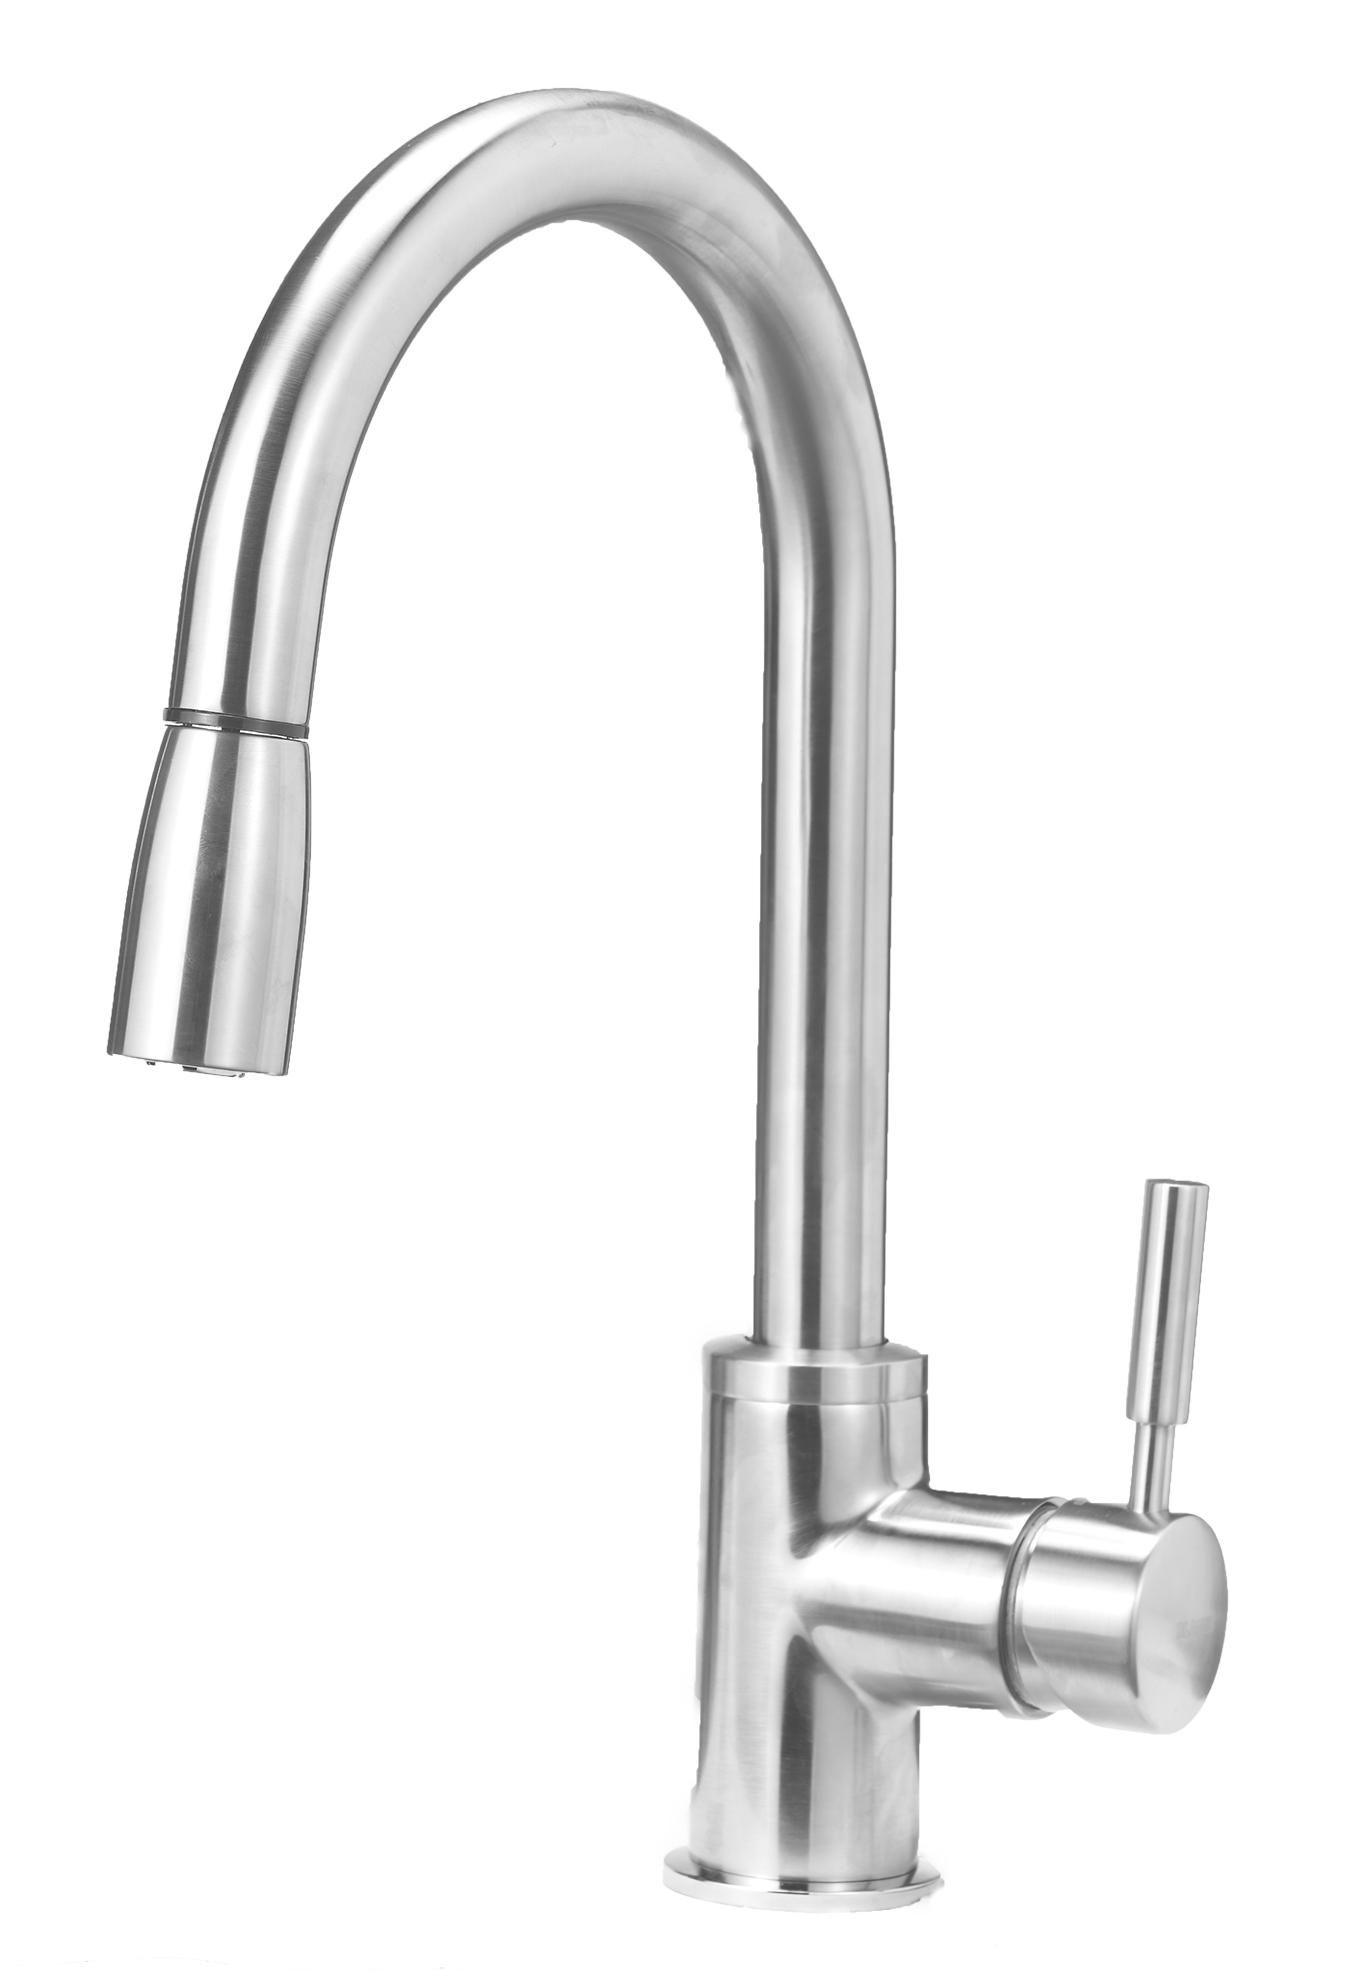 Blanco water saving faucet - 441642-sono-sil-ss_path_5x7.jpg